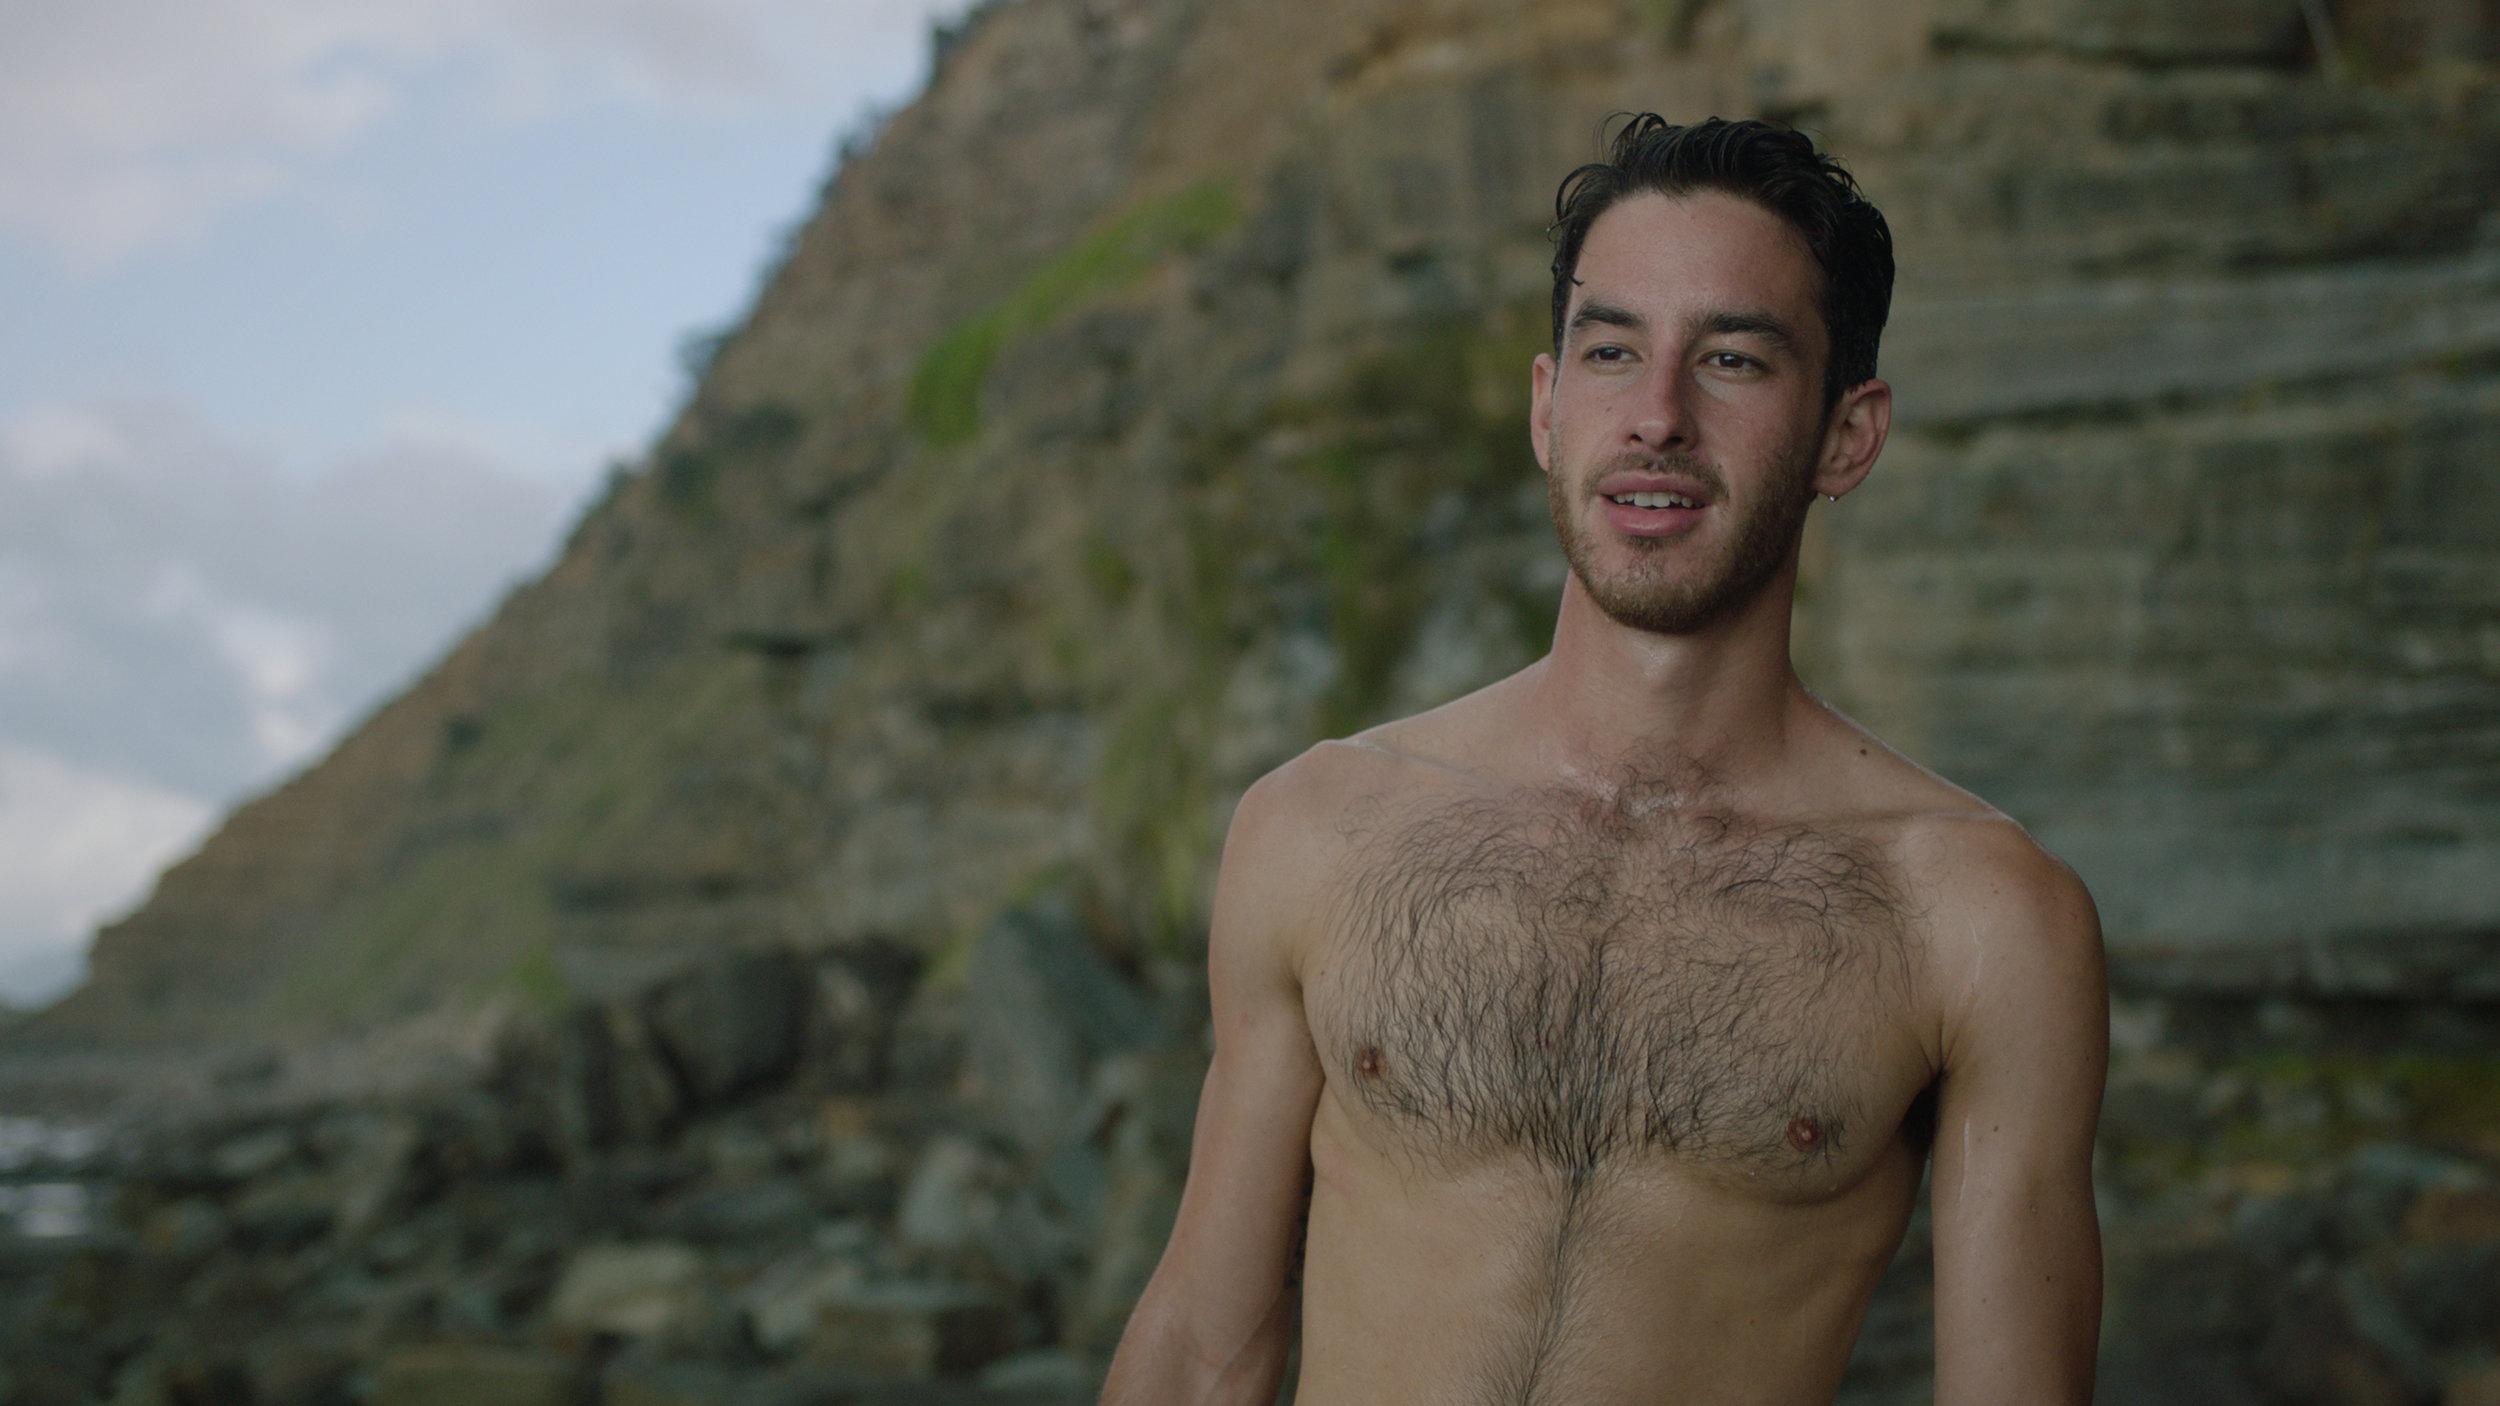 Adam Marks in 'Black Lips'